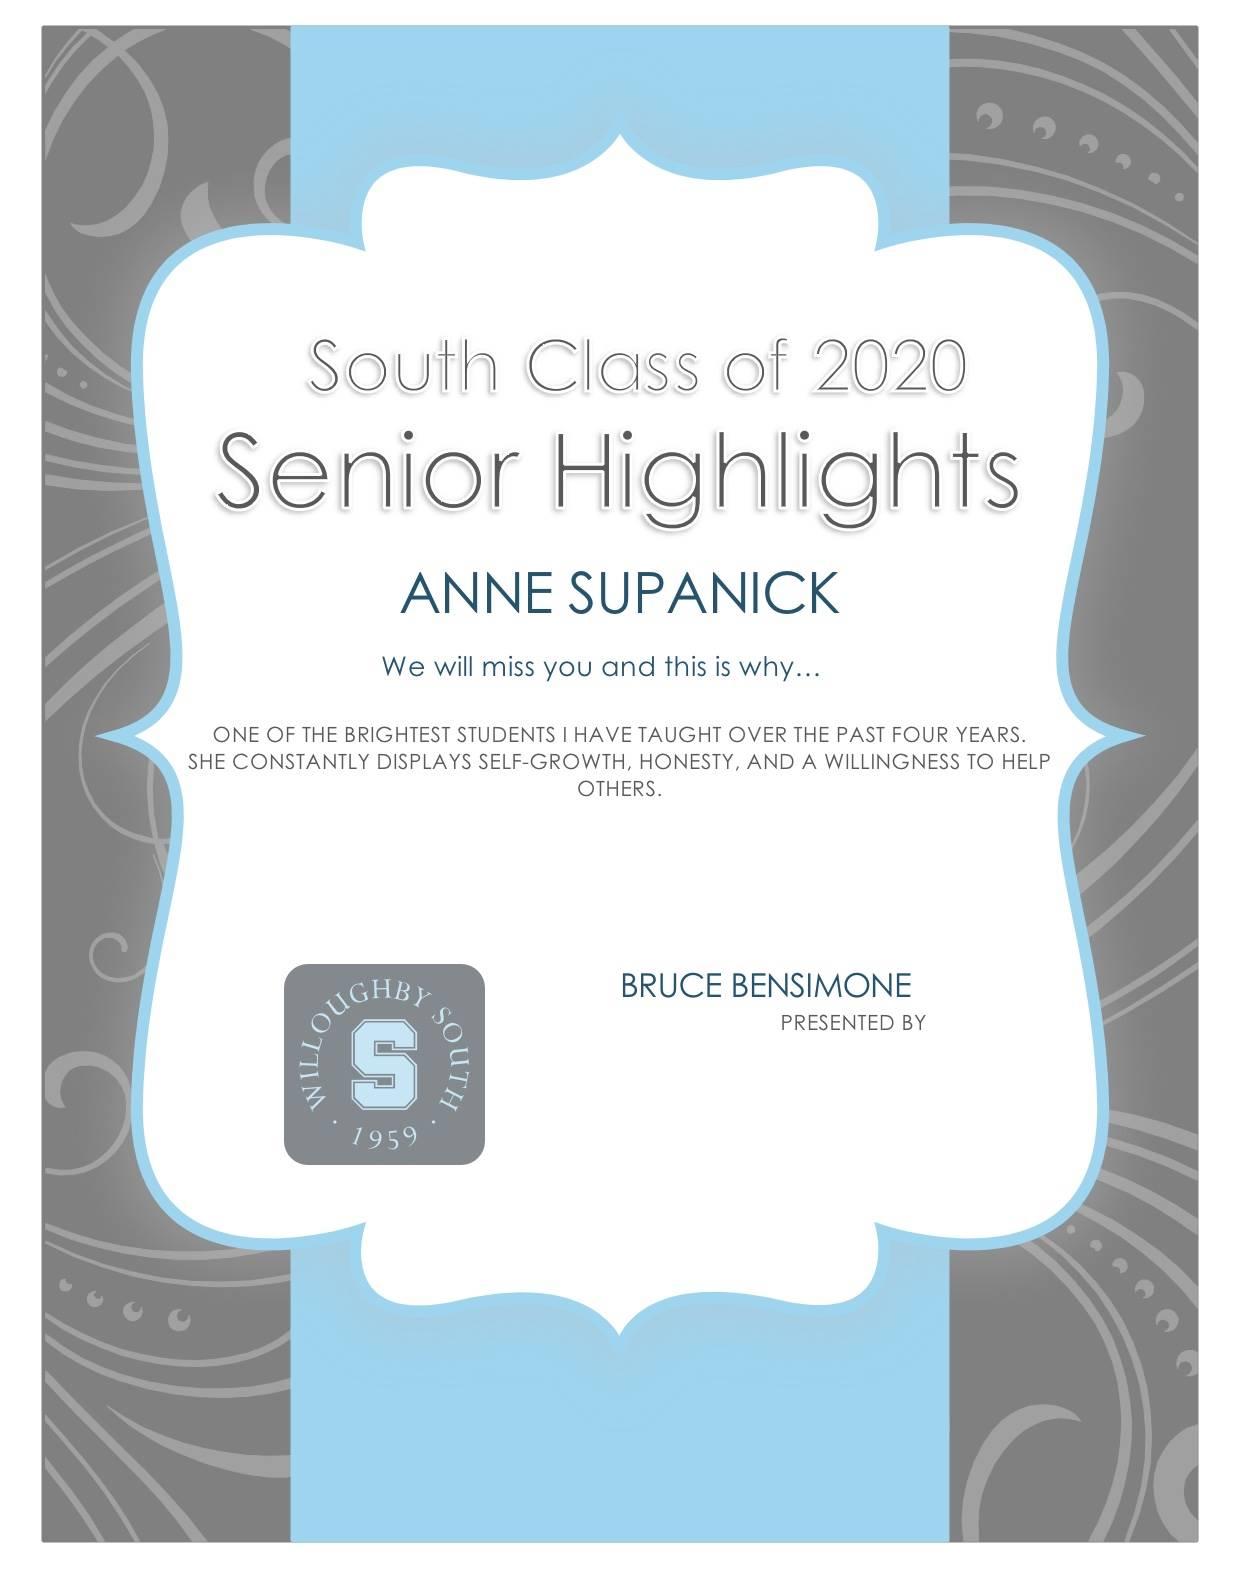 Anne Supanick